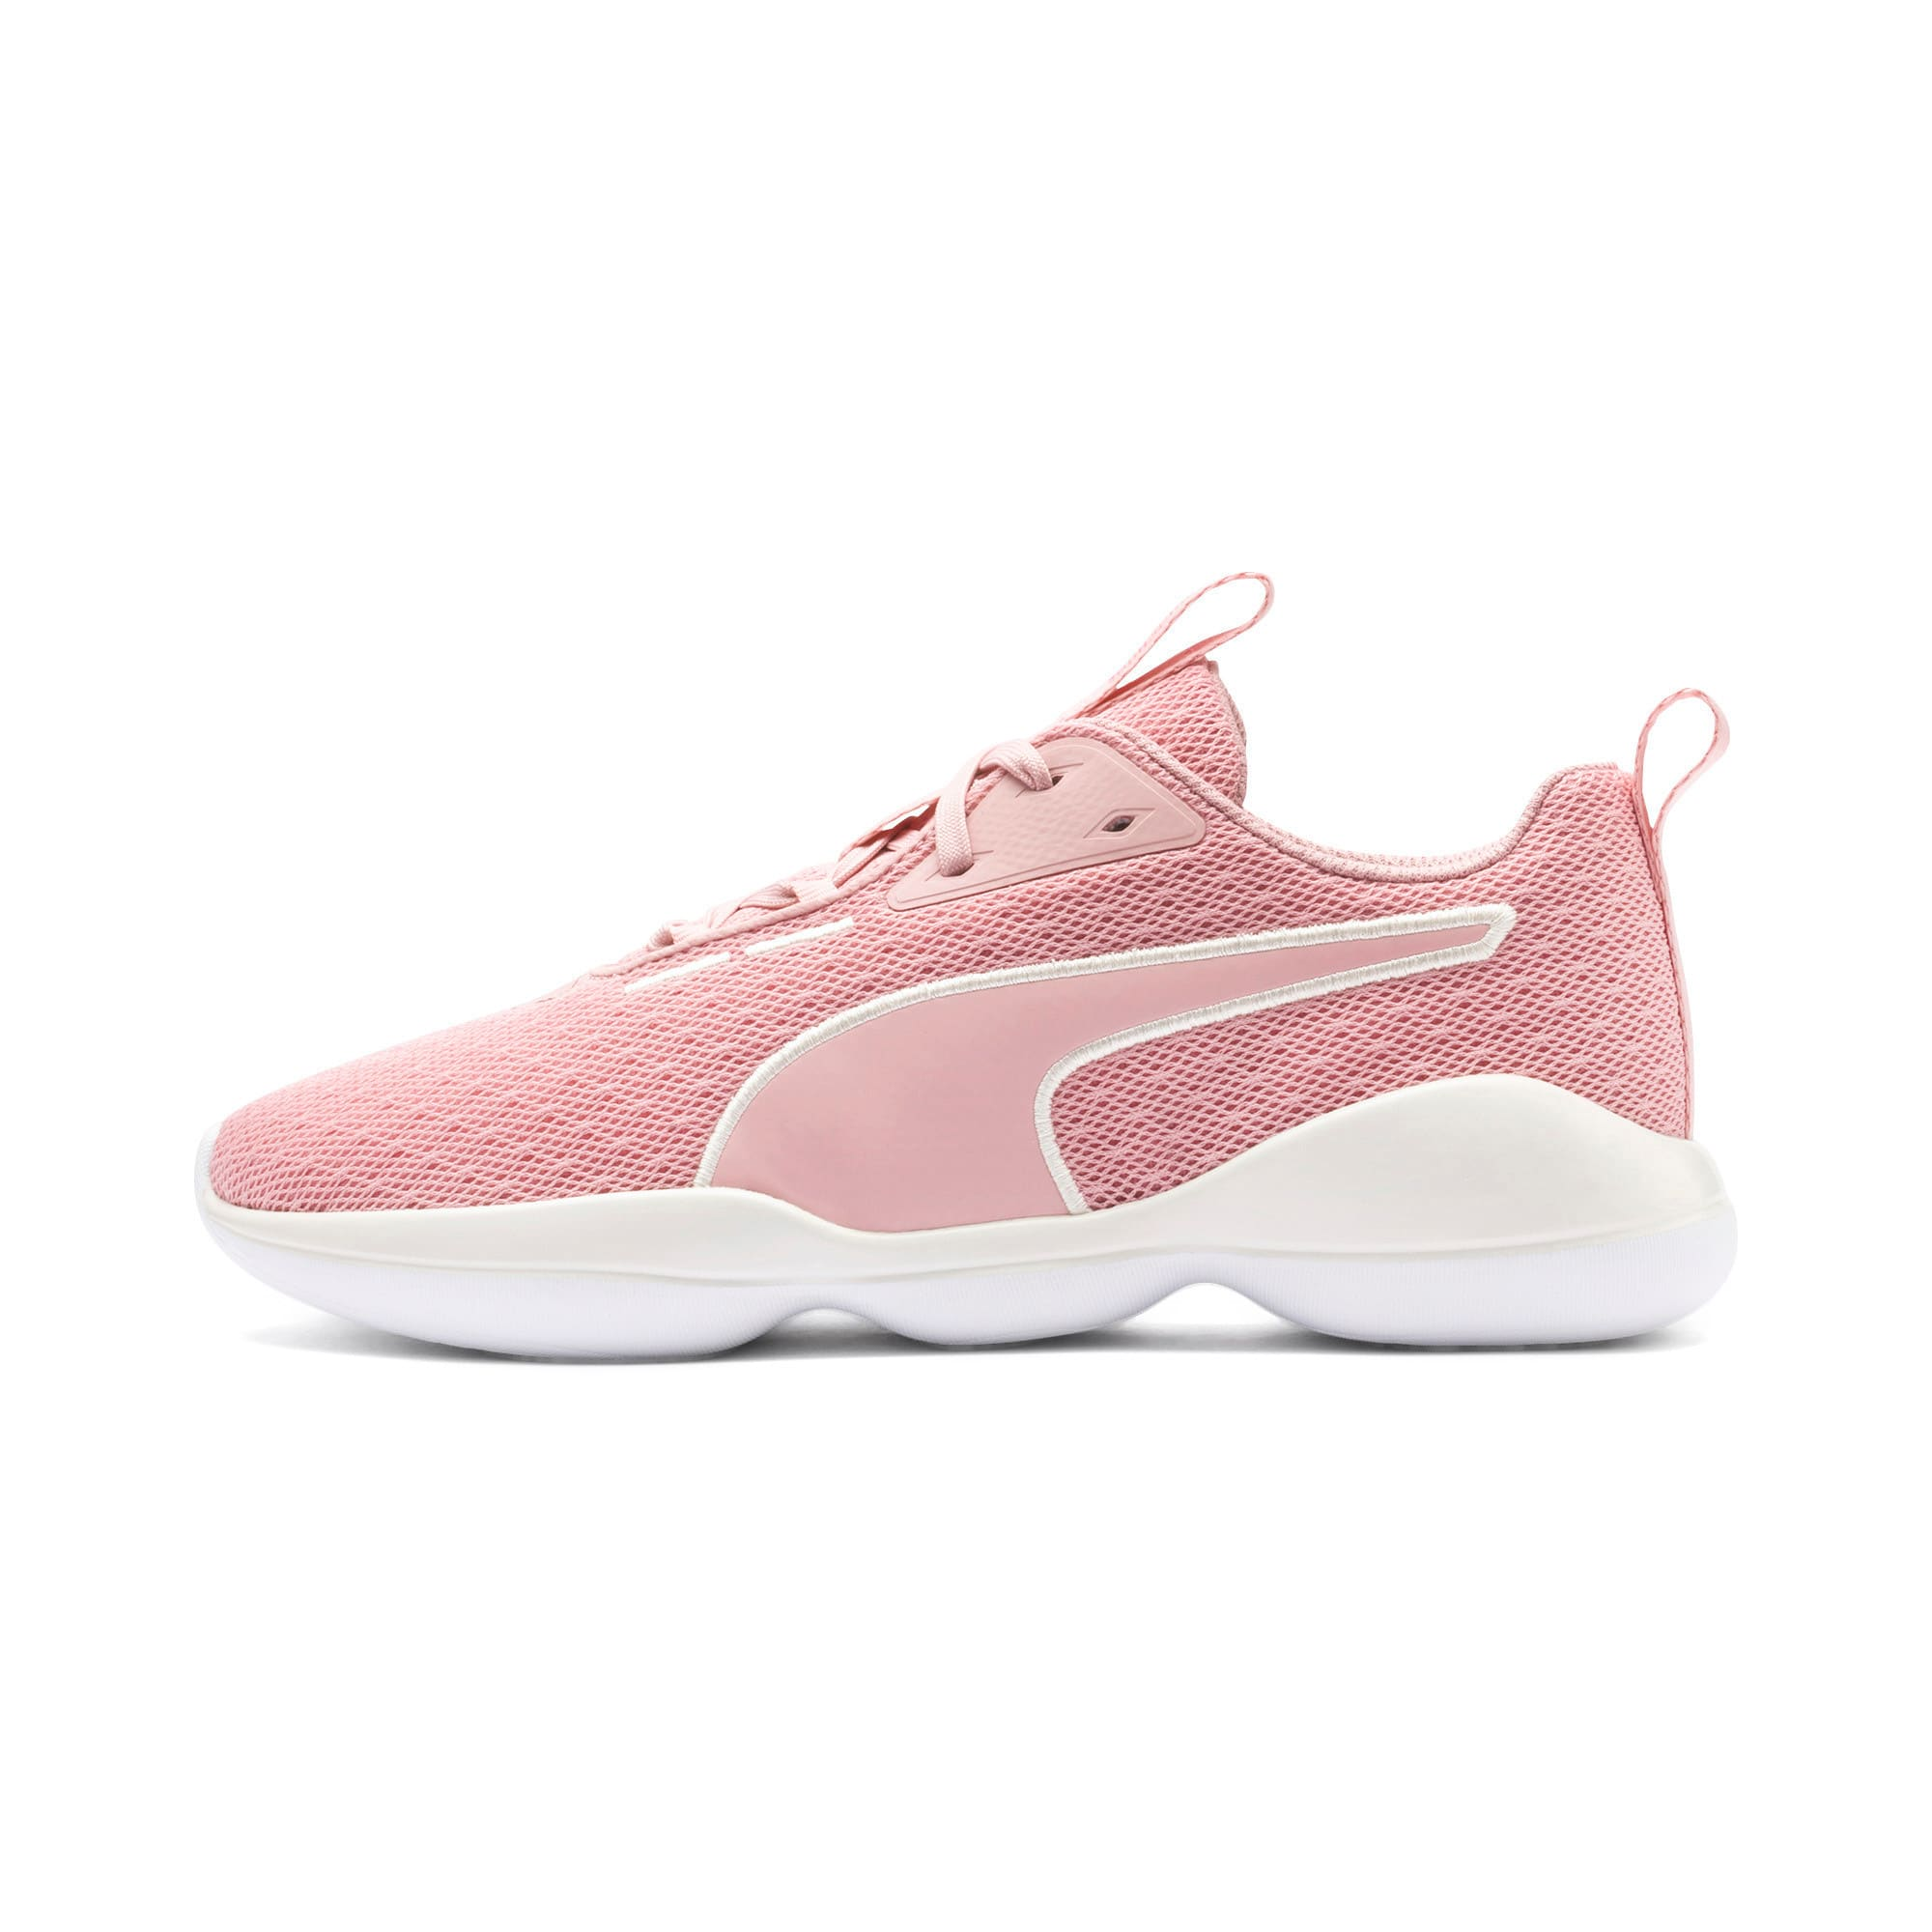 Thumbnail 1 of Flourish FS Women's Running Shoes, Bridal Rose-Puma White, medium-IND